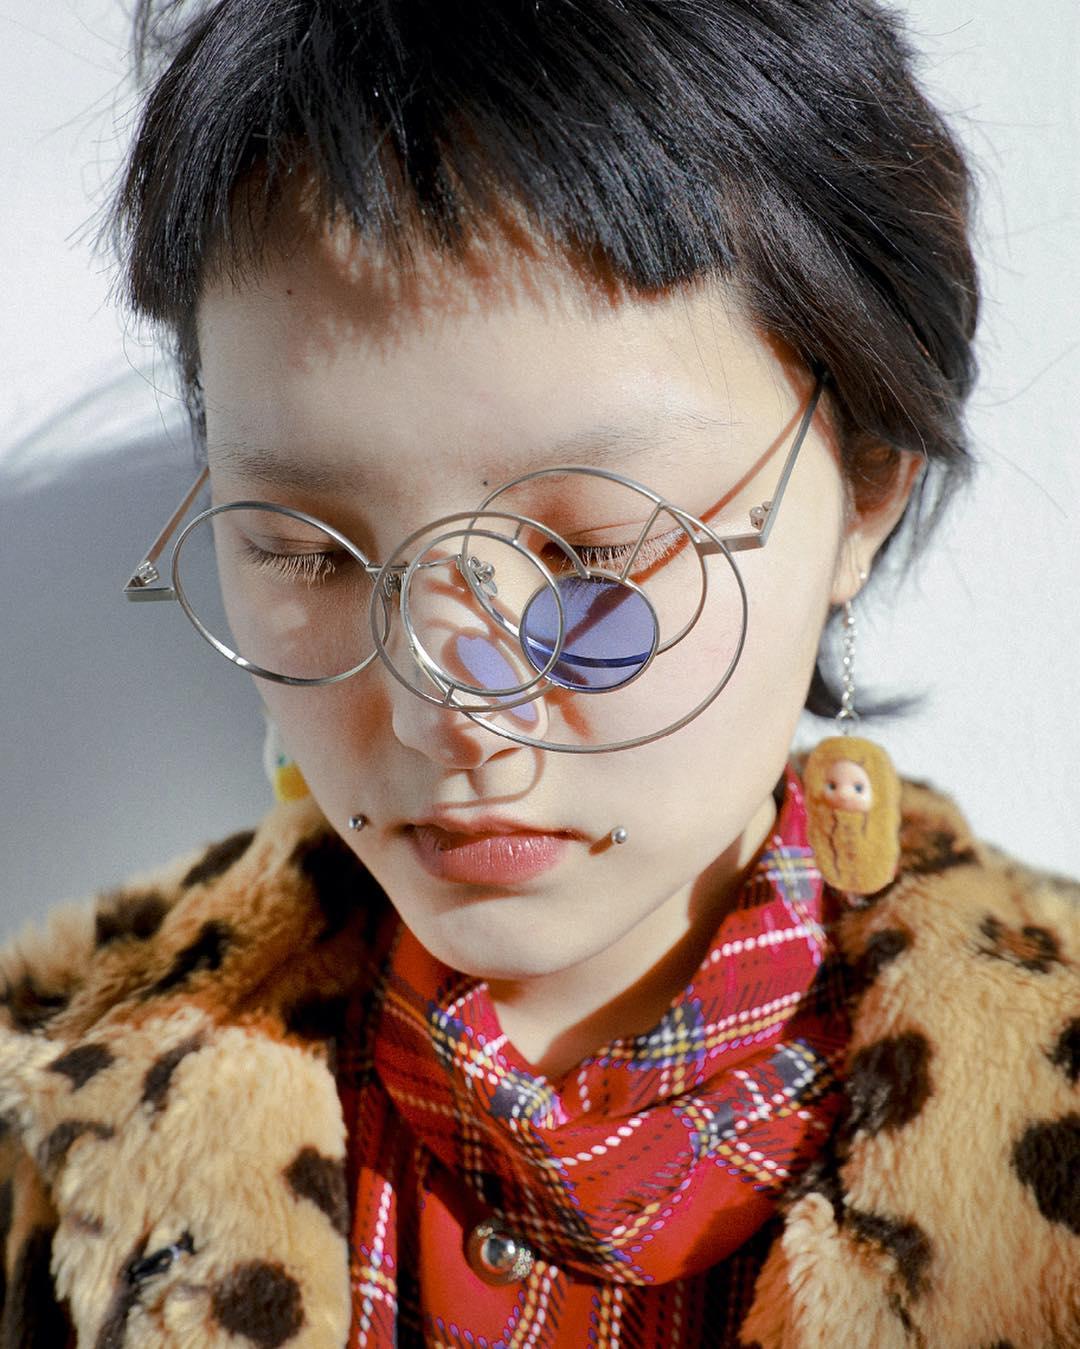 Honggang Lu Lunar Eclipse glasses. Available at Chop Suey Club NYC!